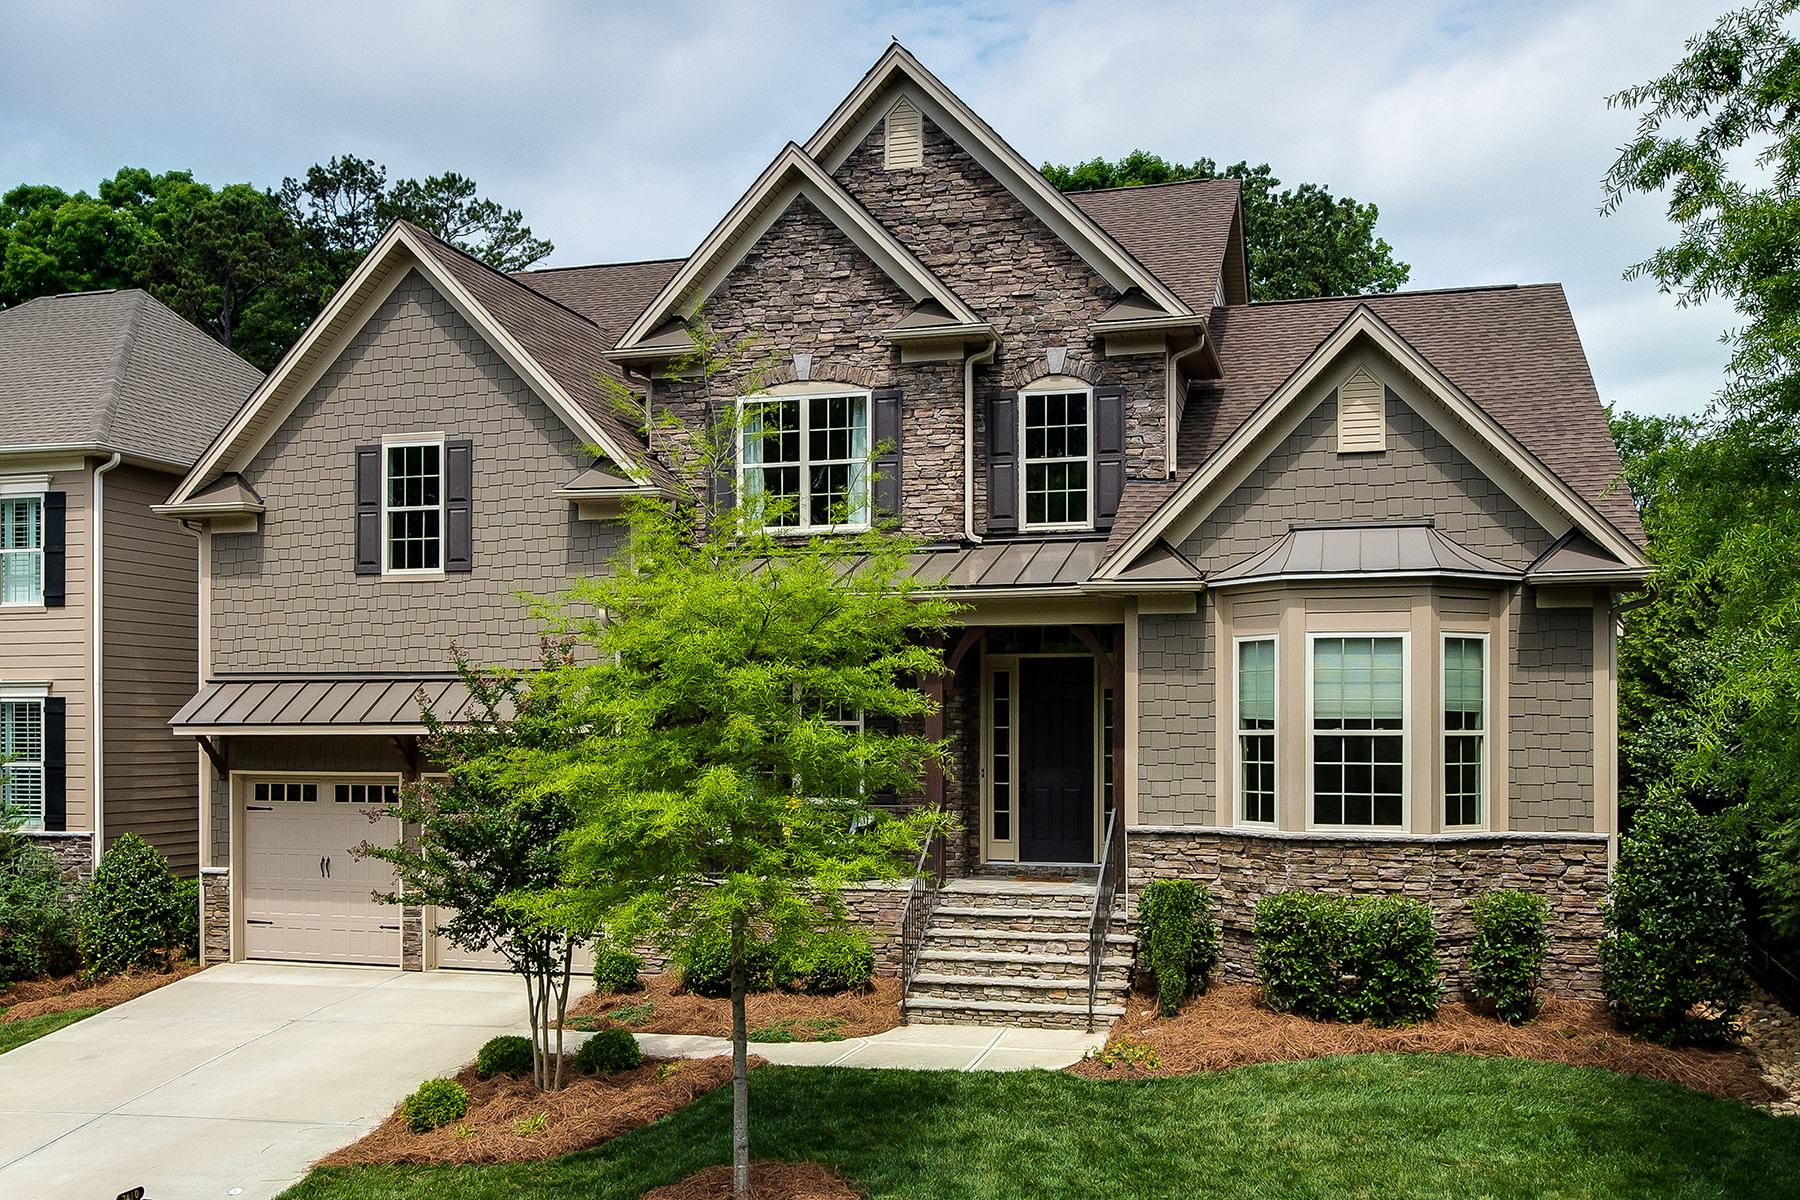 Single Family Home for Sale at BELLMORE HALL 7410 Edenbridge Ln Charlotte, North Carolina, 28226 United States